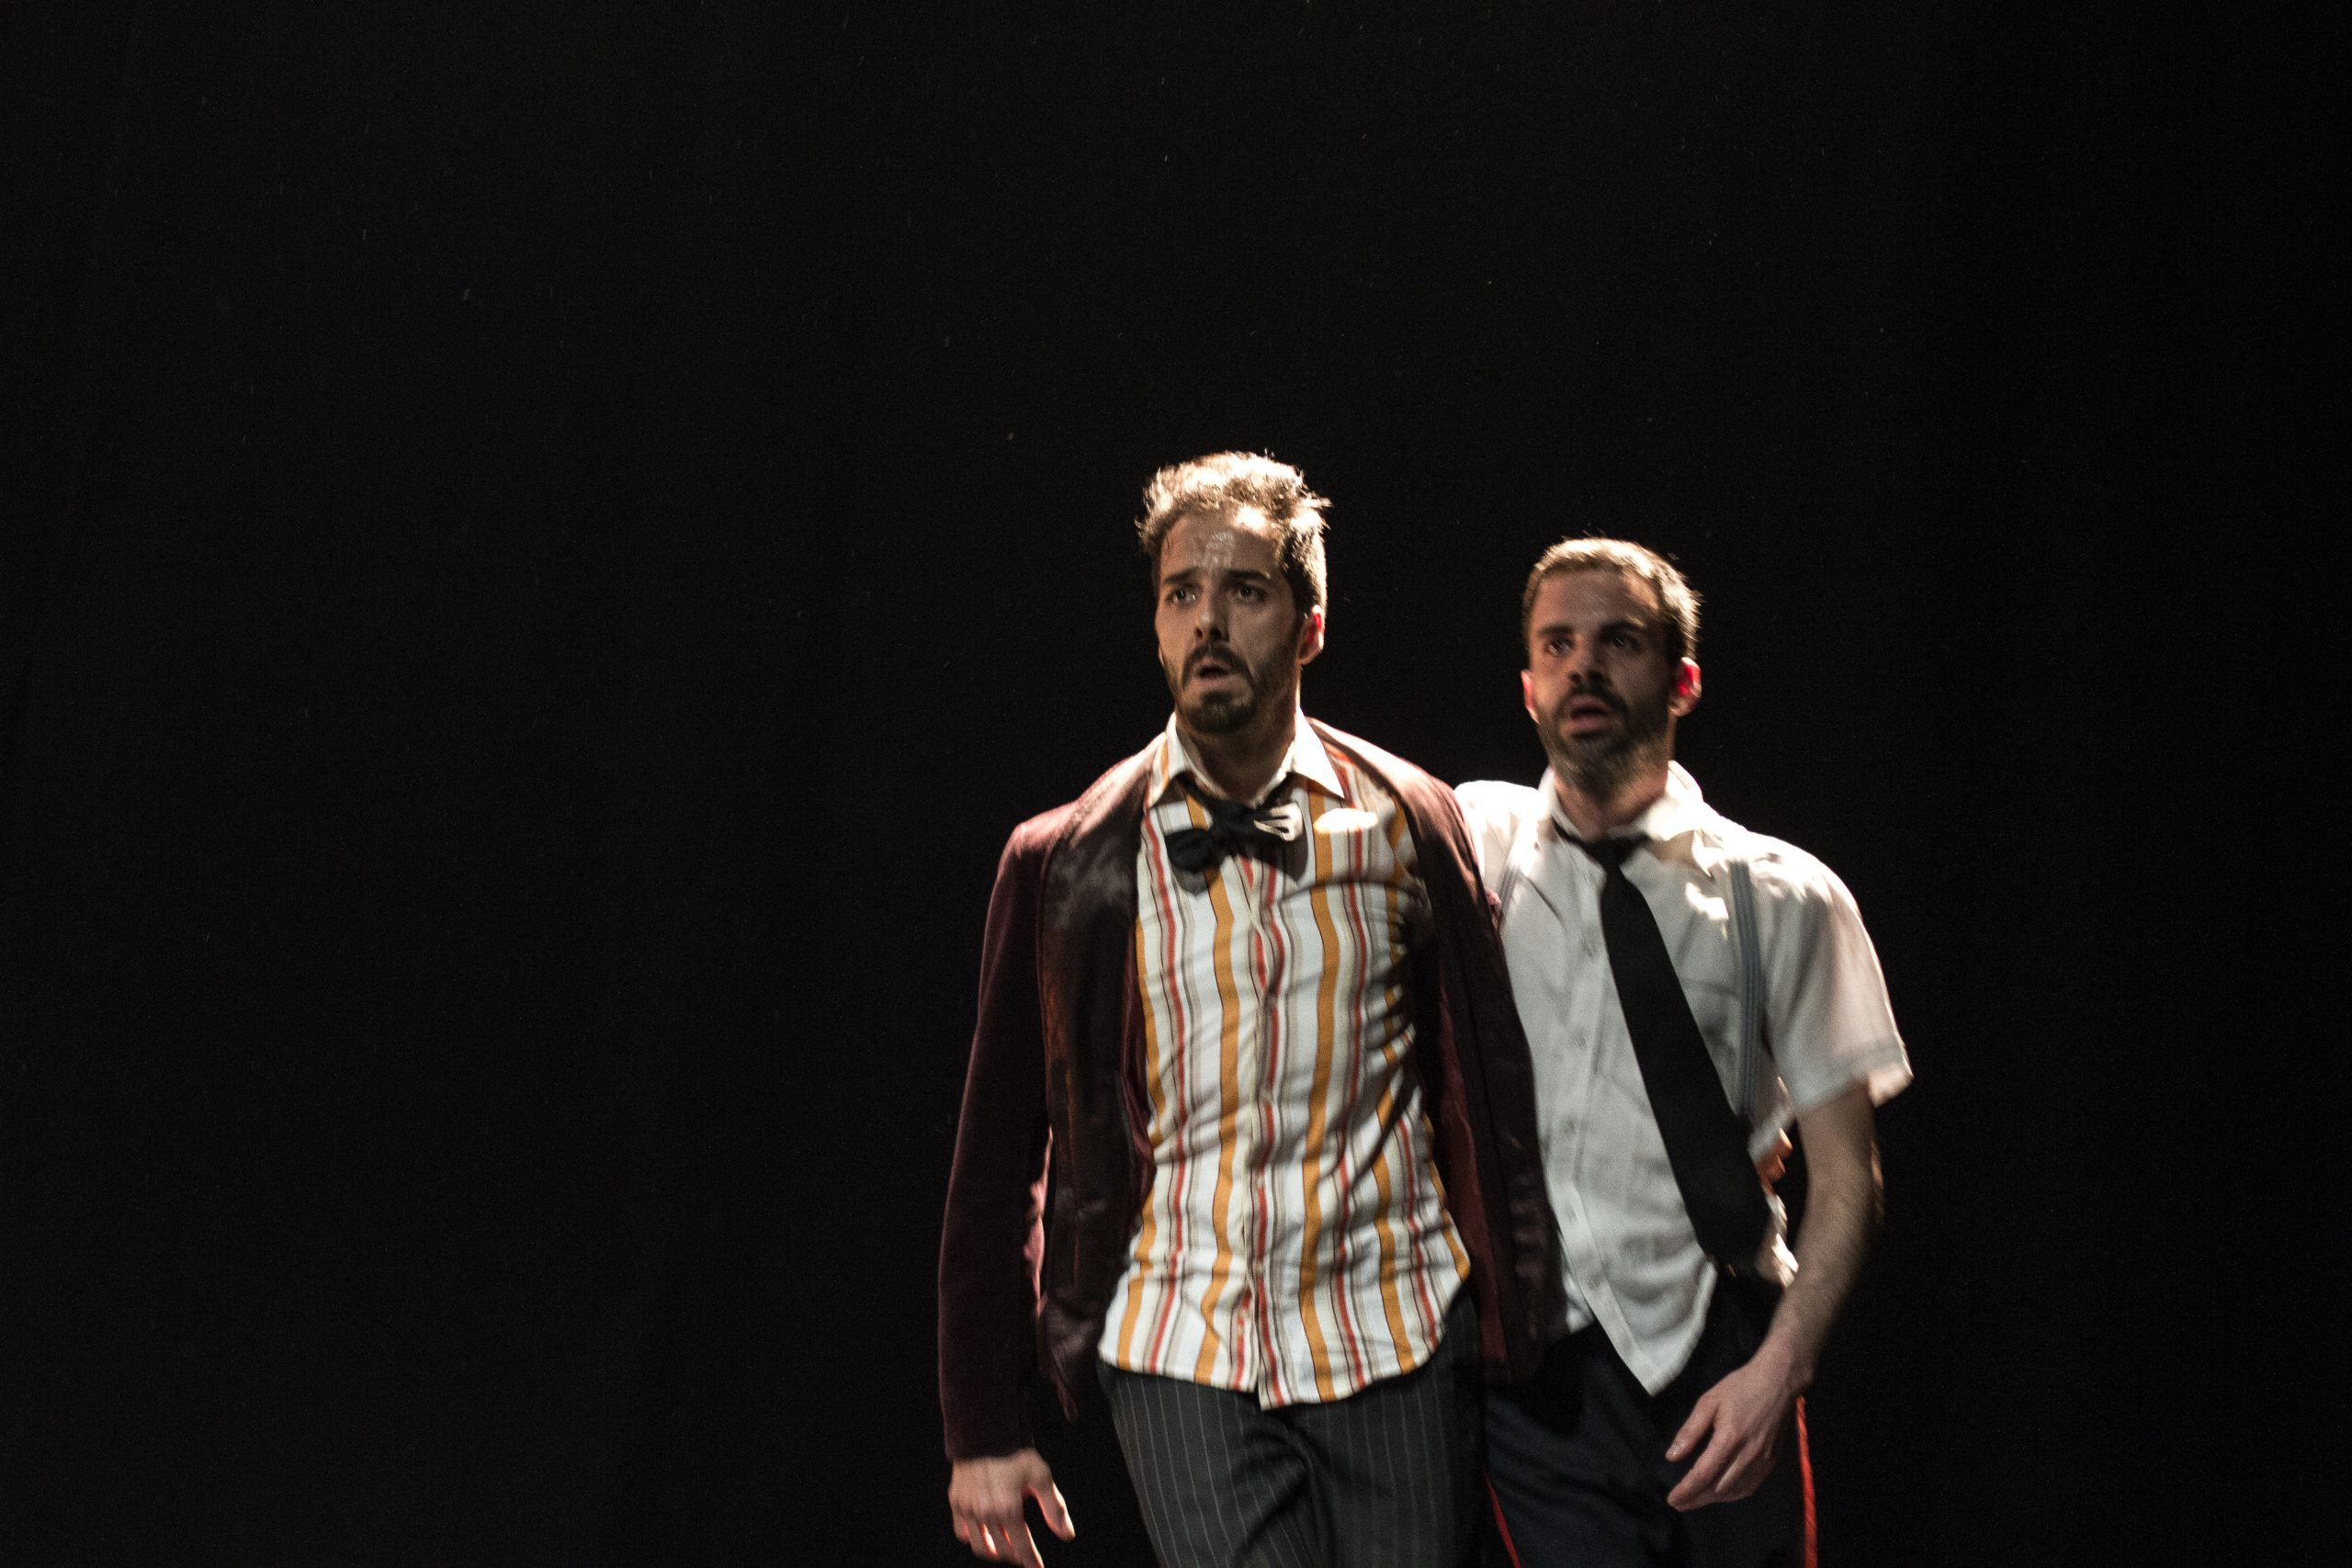 Rodolfo Sacristan Caballitos de Anis teatro actor